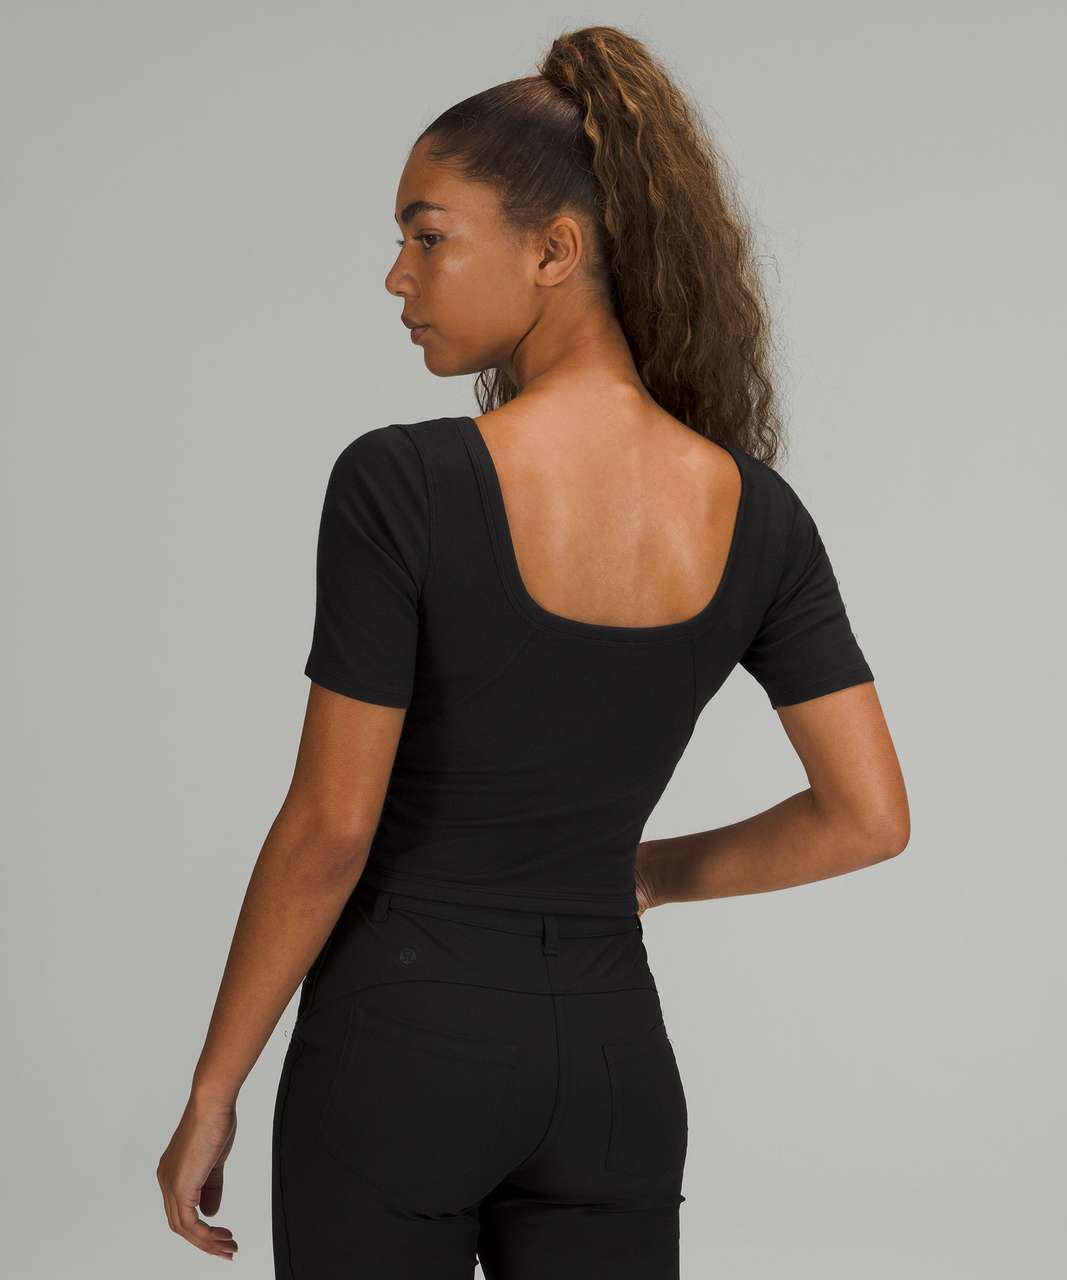 Lululemon Ribbed Held Tight Short Sleeve Shirt - Black